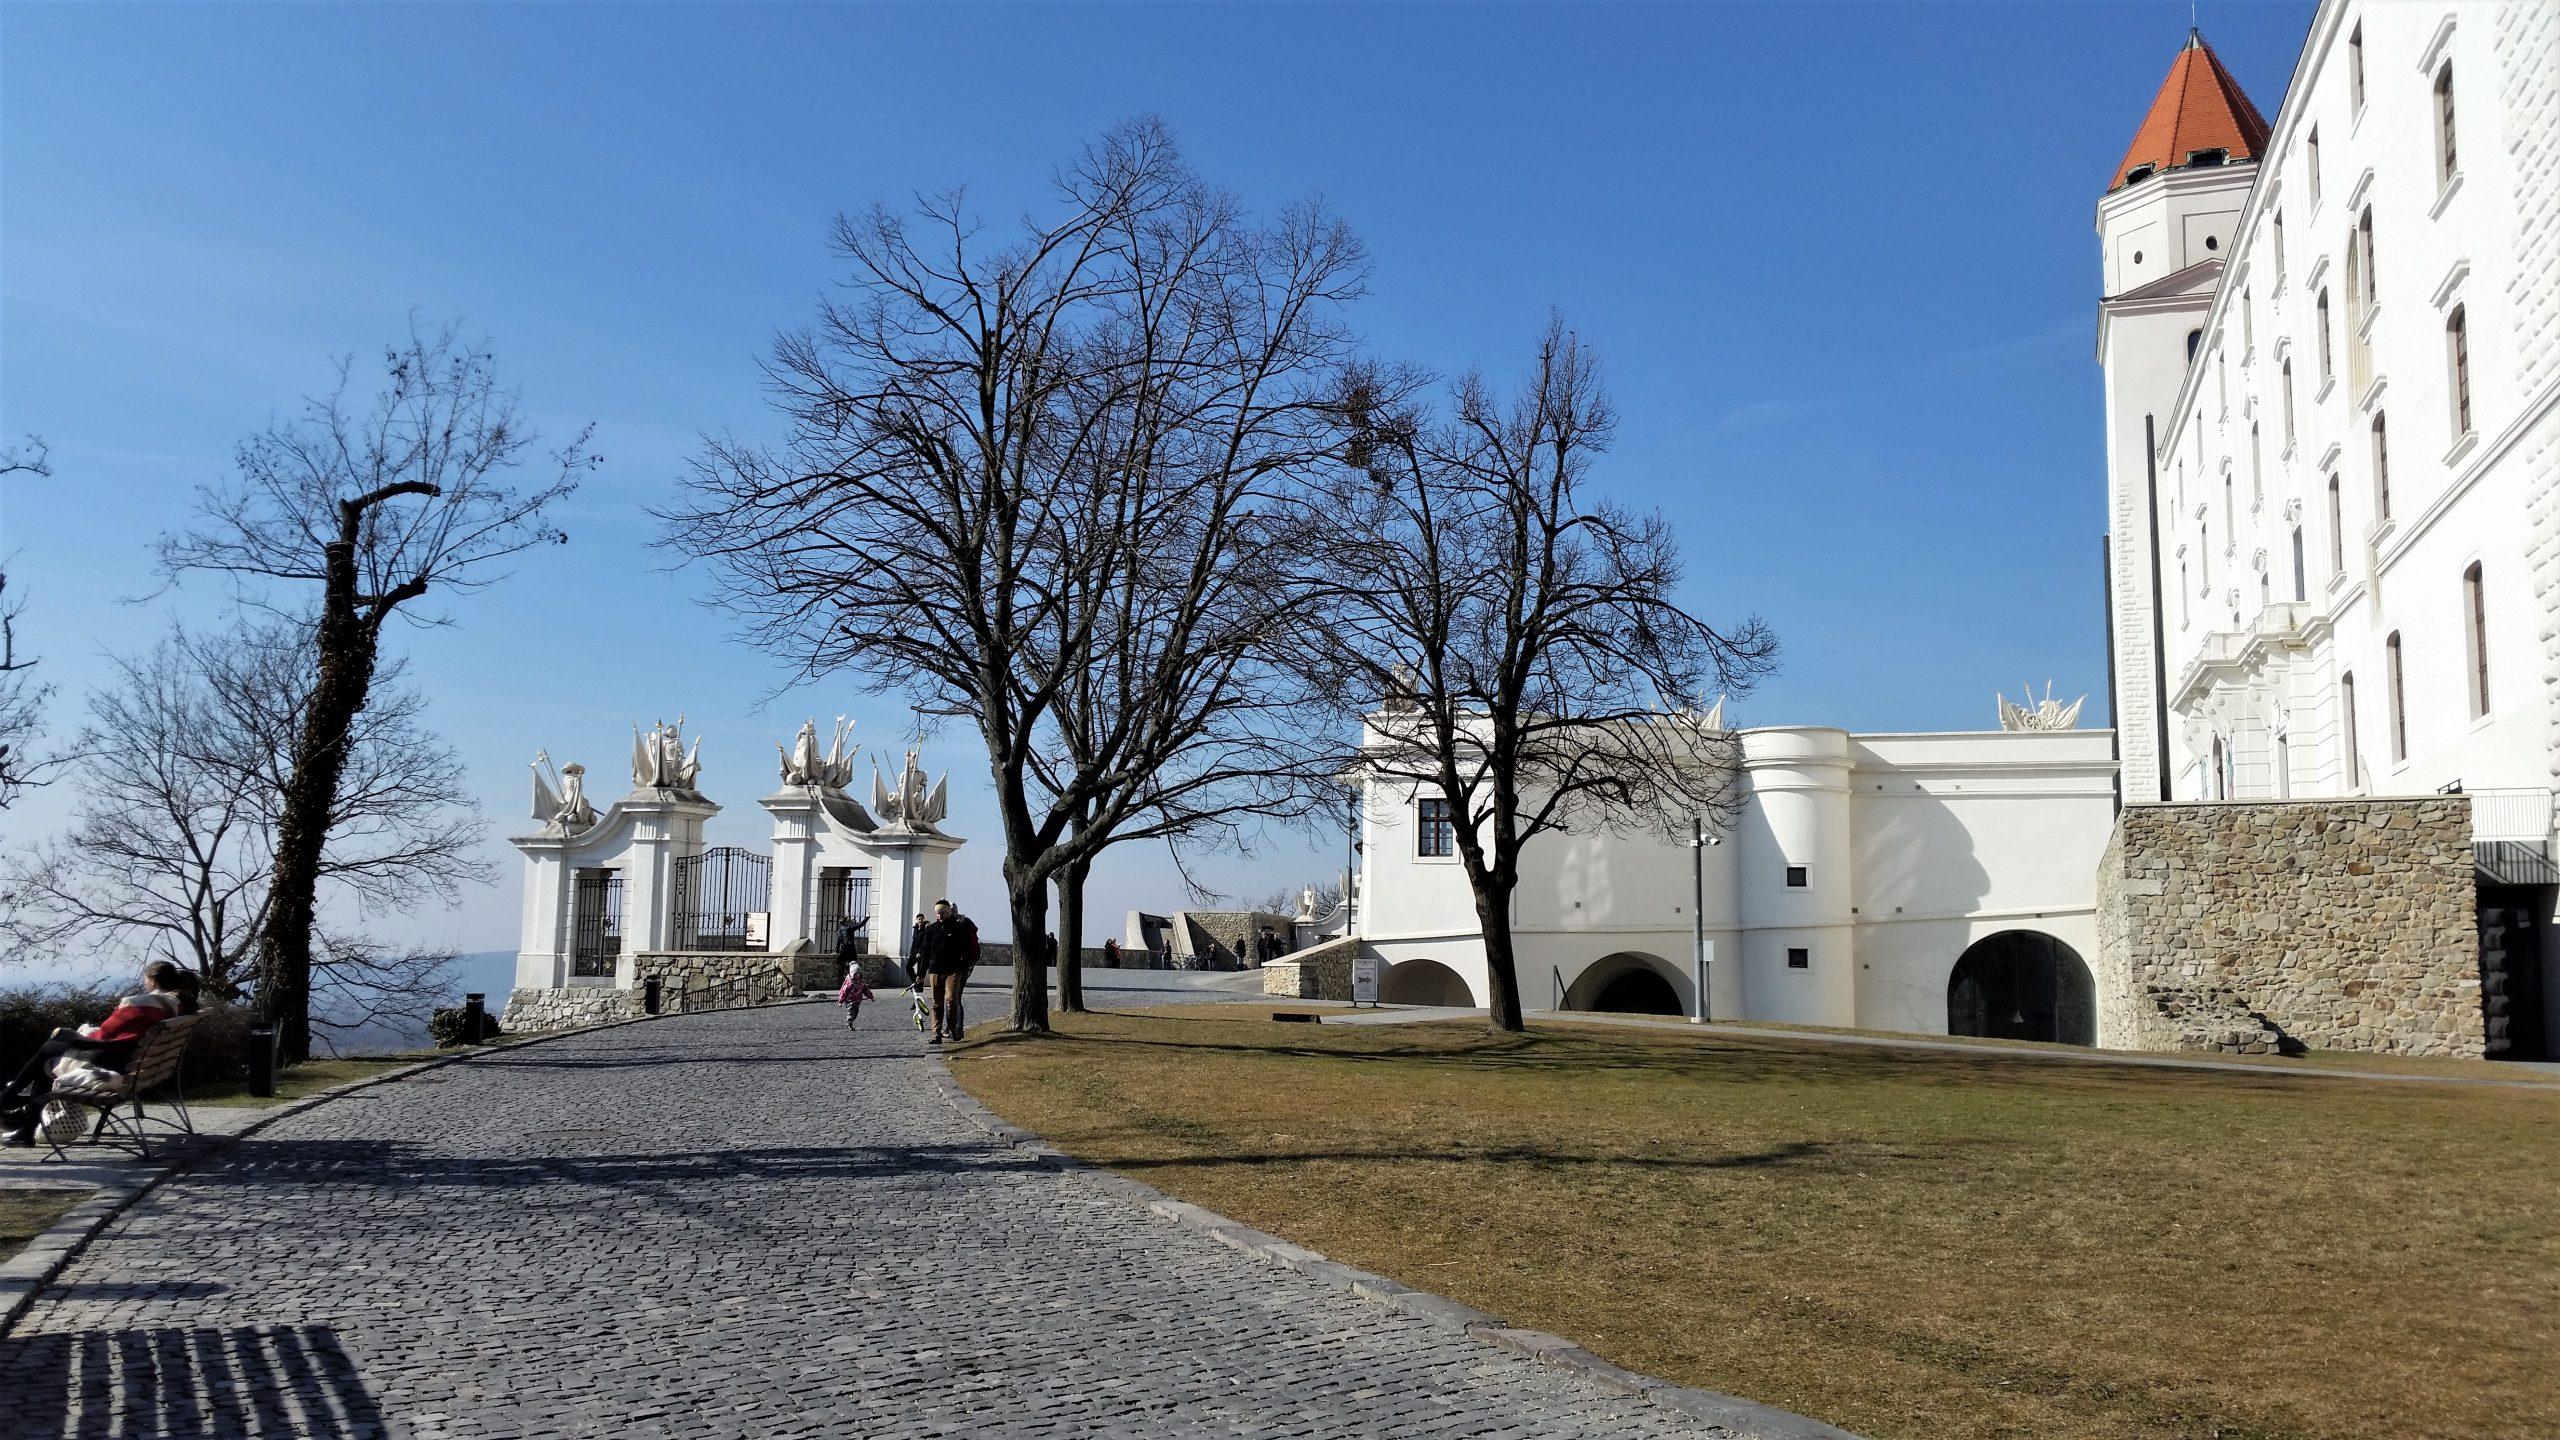 Burg Hinterhof